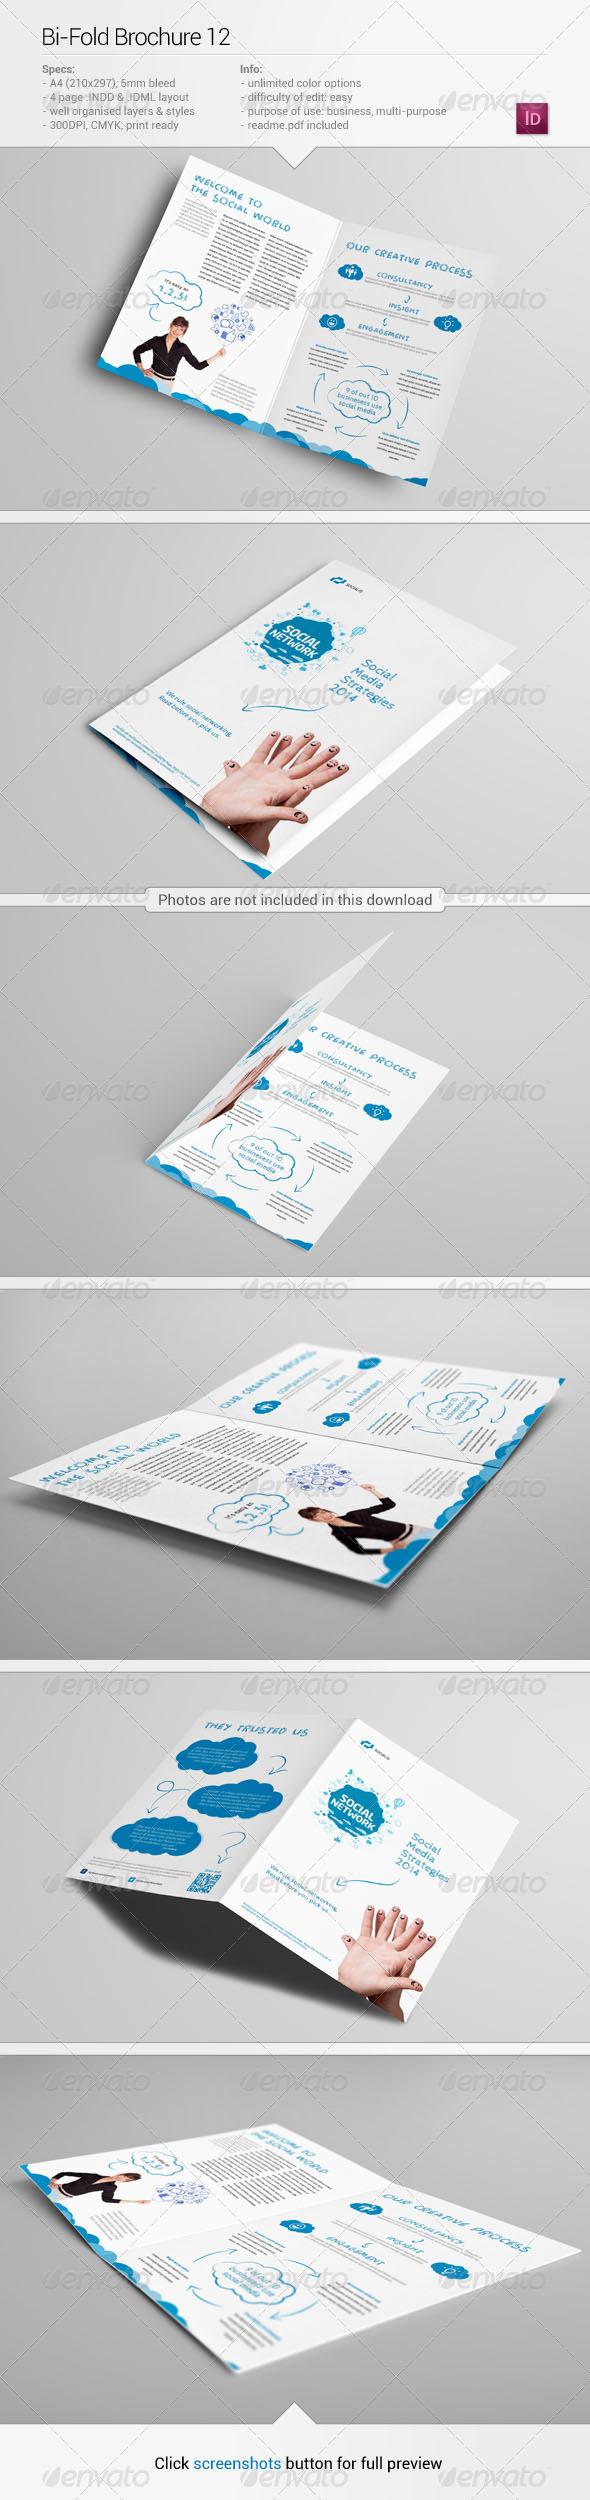 Bi-Fold Brochure 12